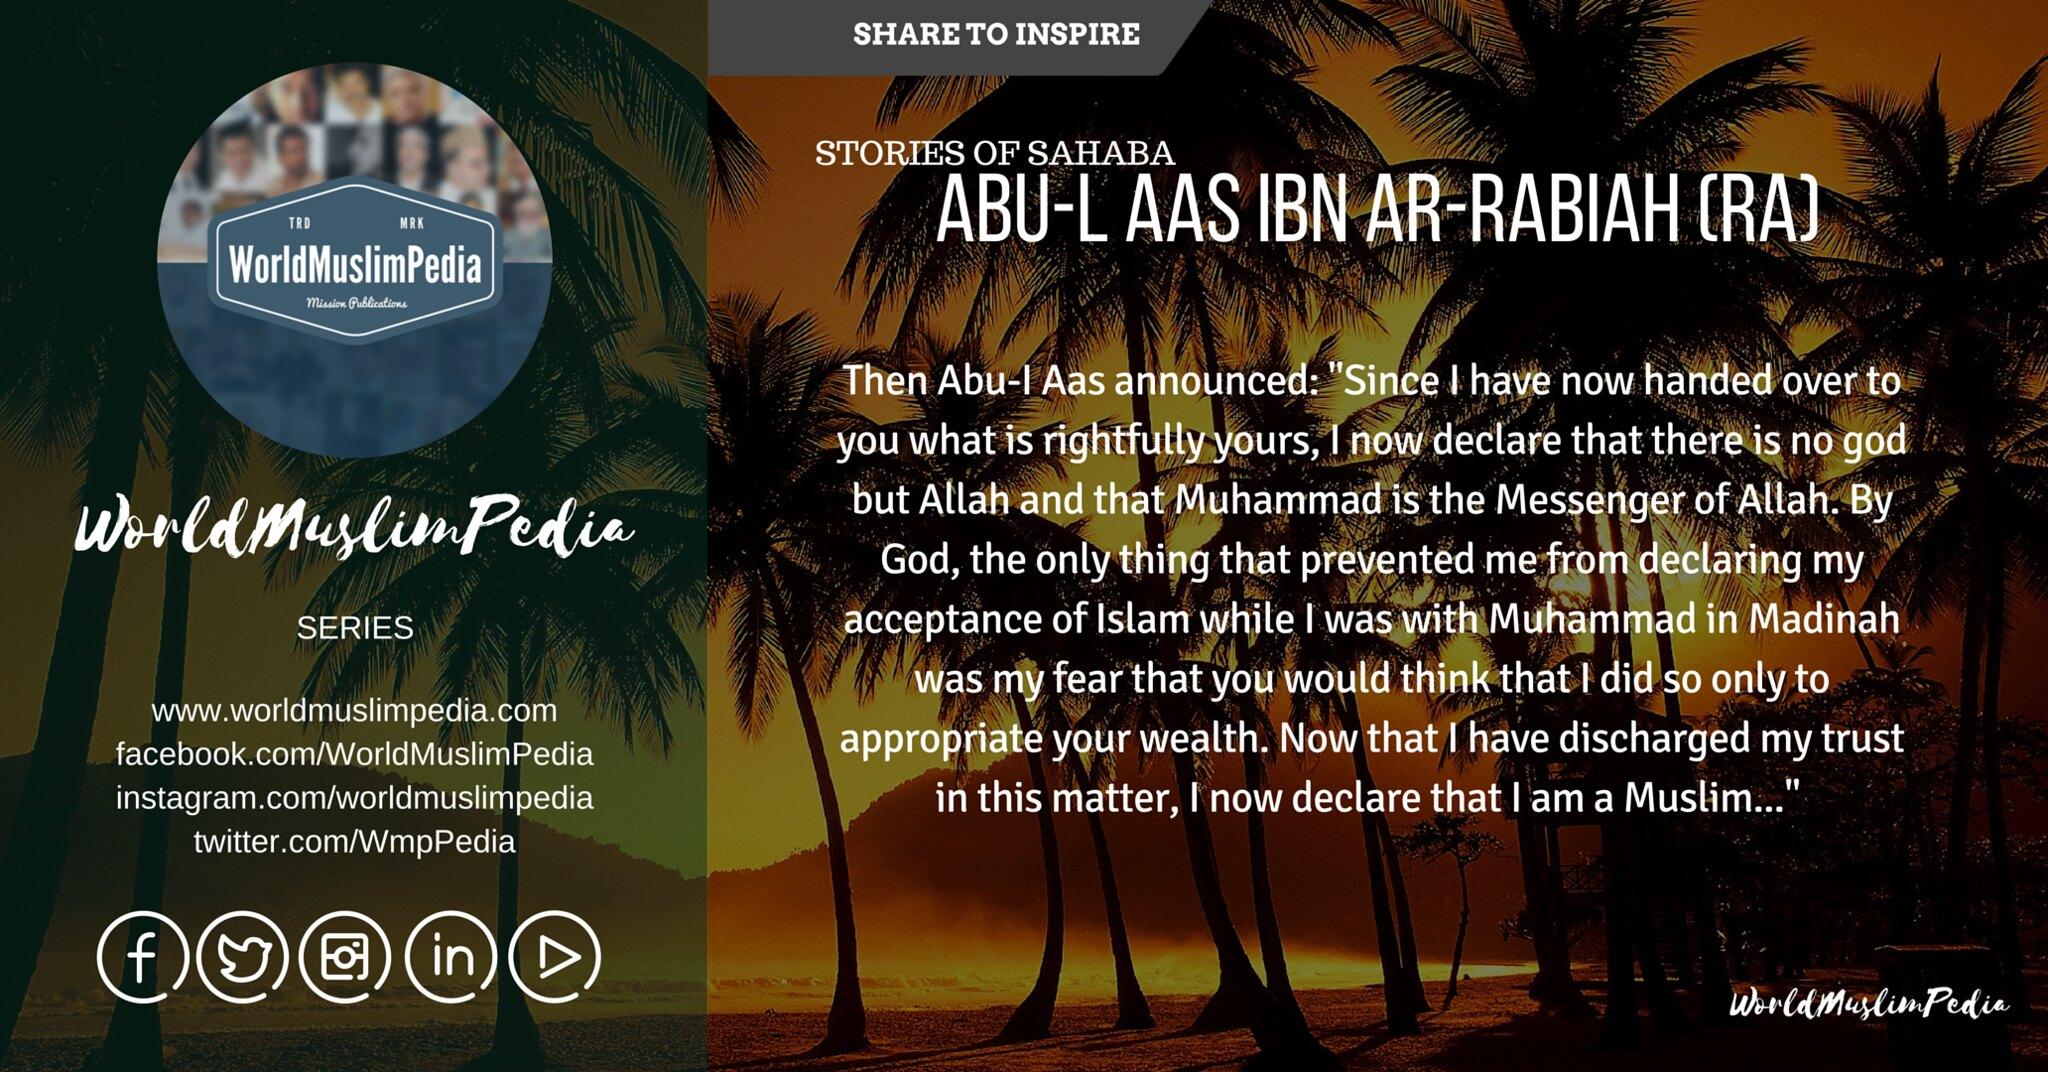 ABU-L AAS IBN AR-RABIAH (RA)